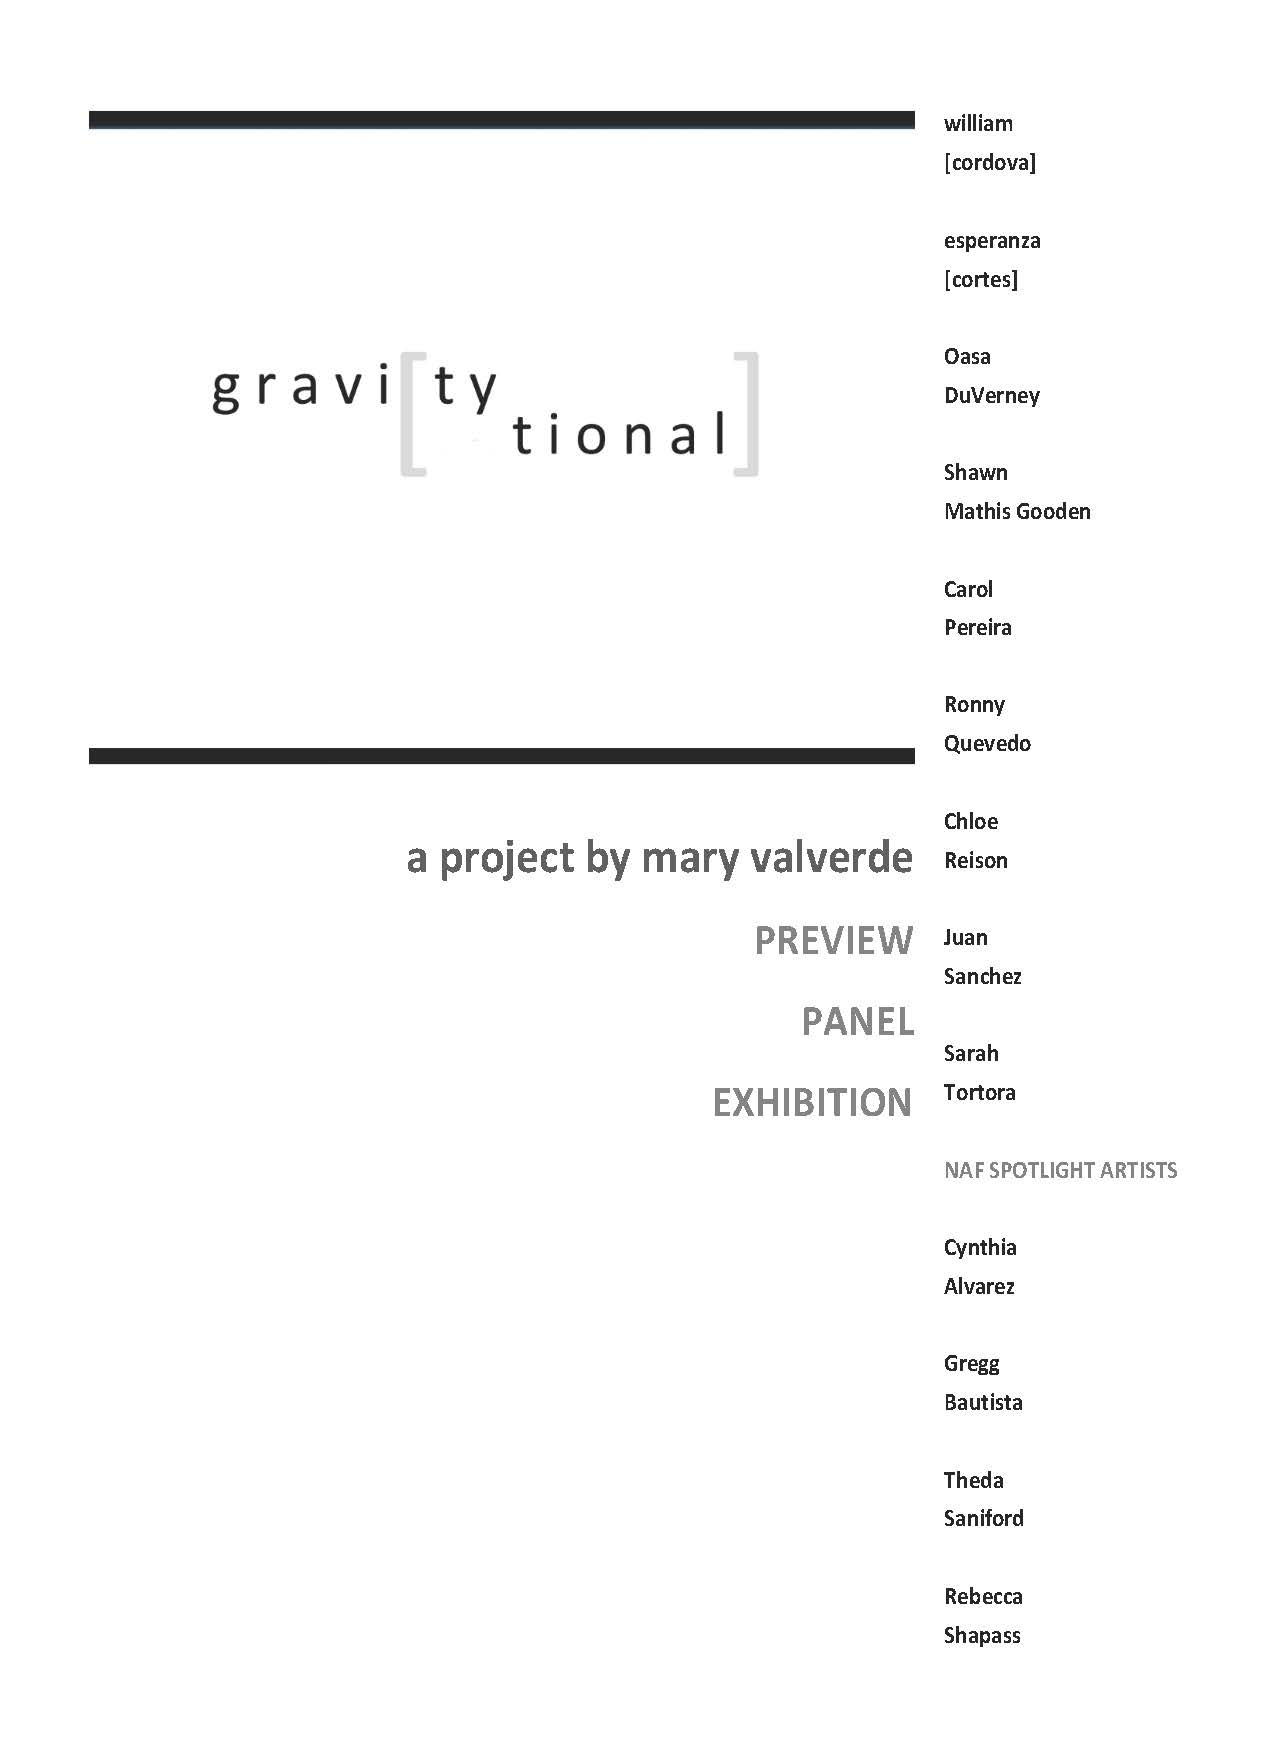 GRAVITY[ATIONAL] (1).jpg